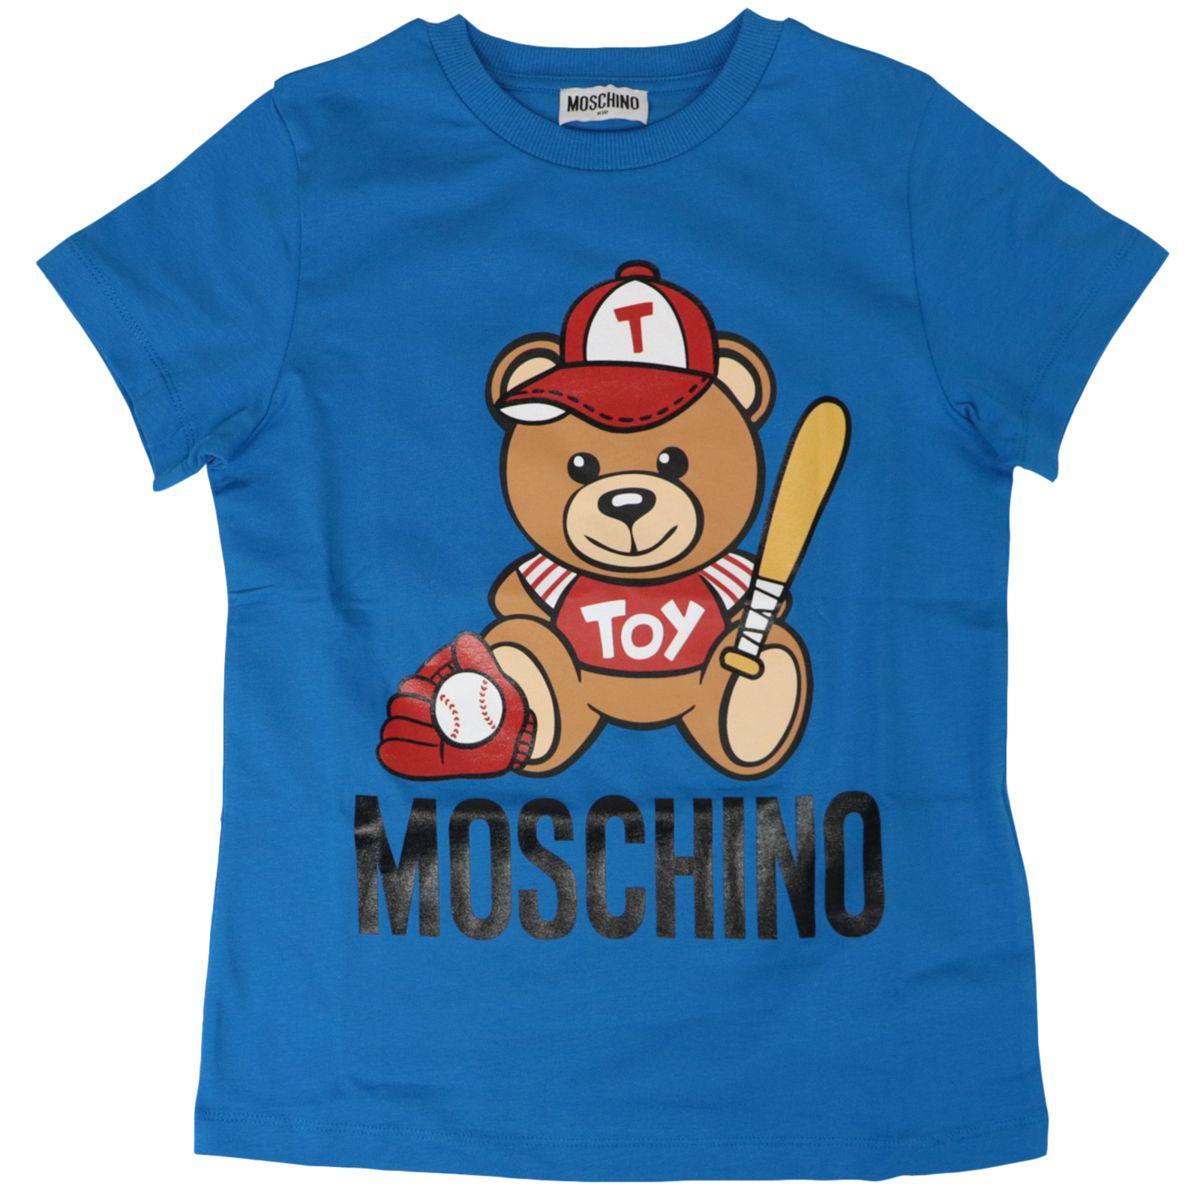 Cotton t-shirt with bear logo print Bluette Moschino